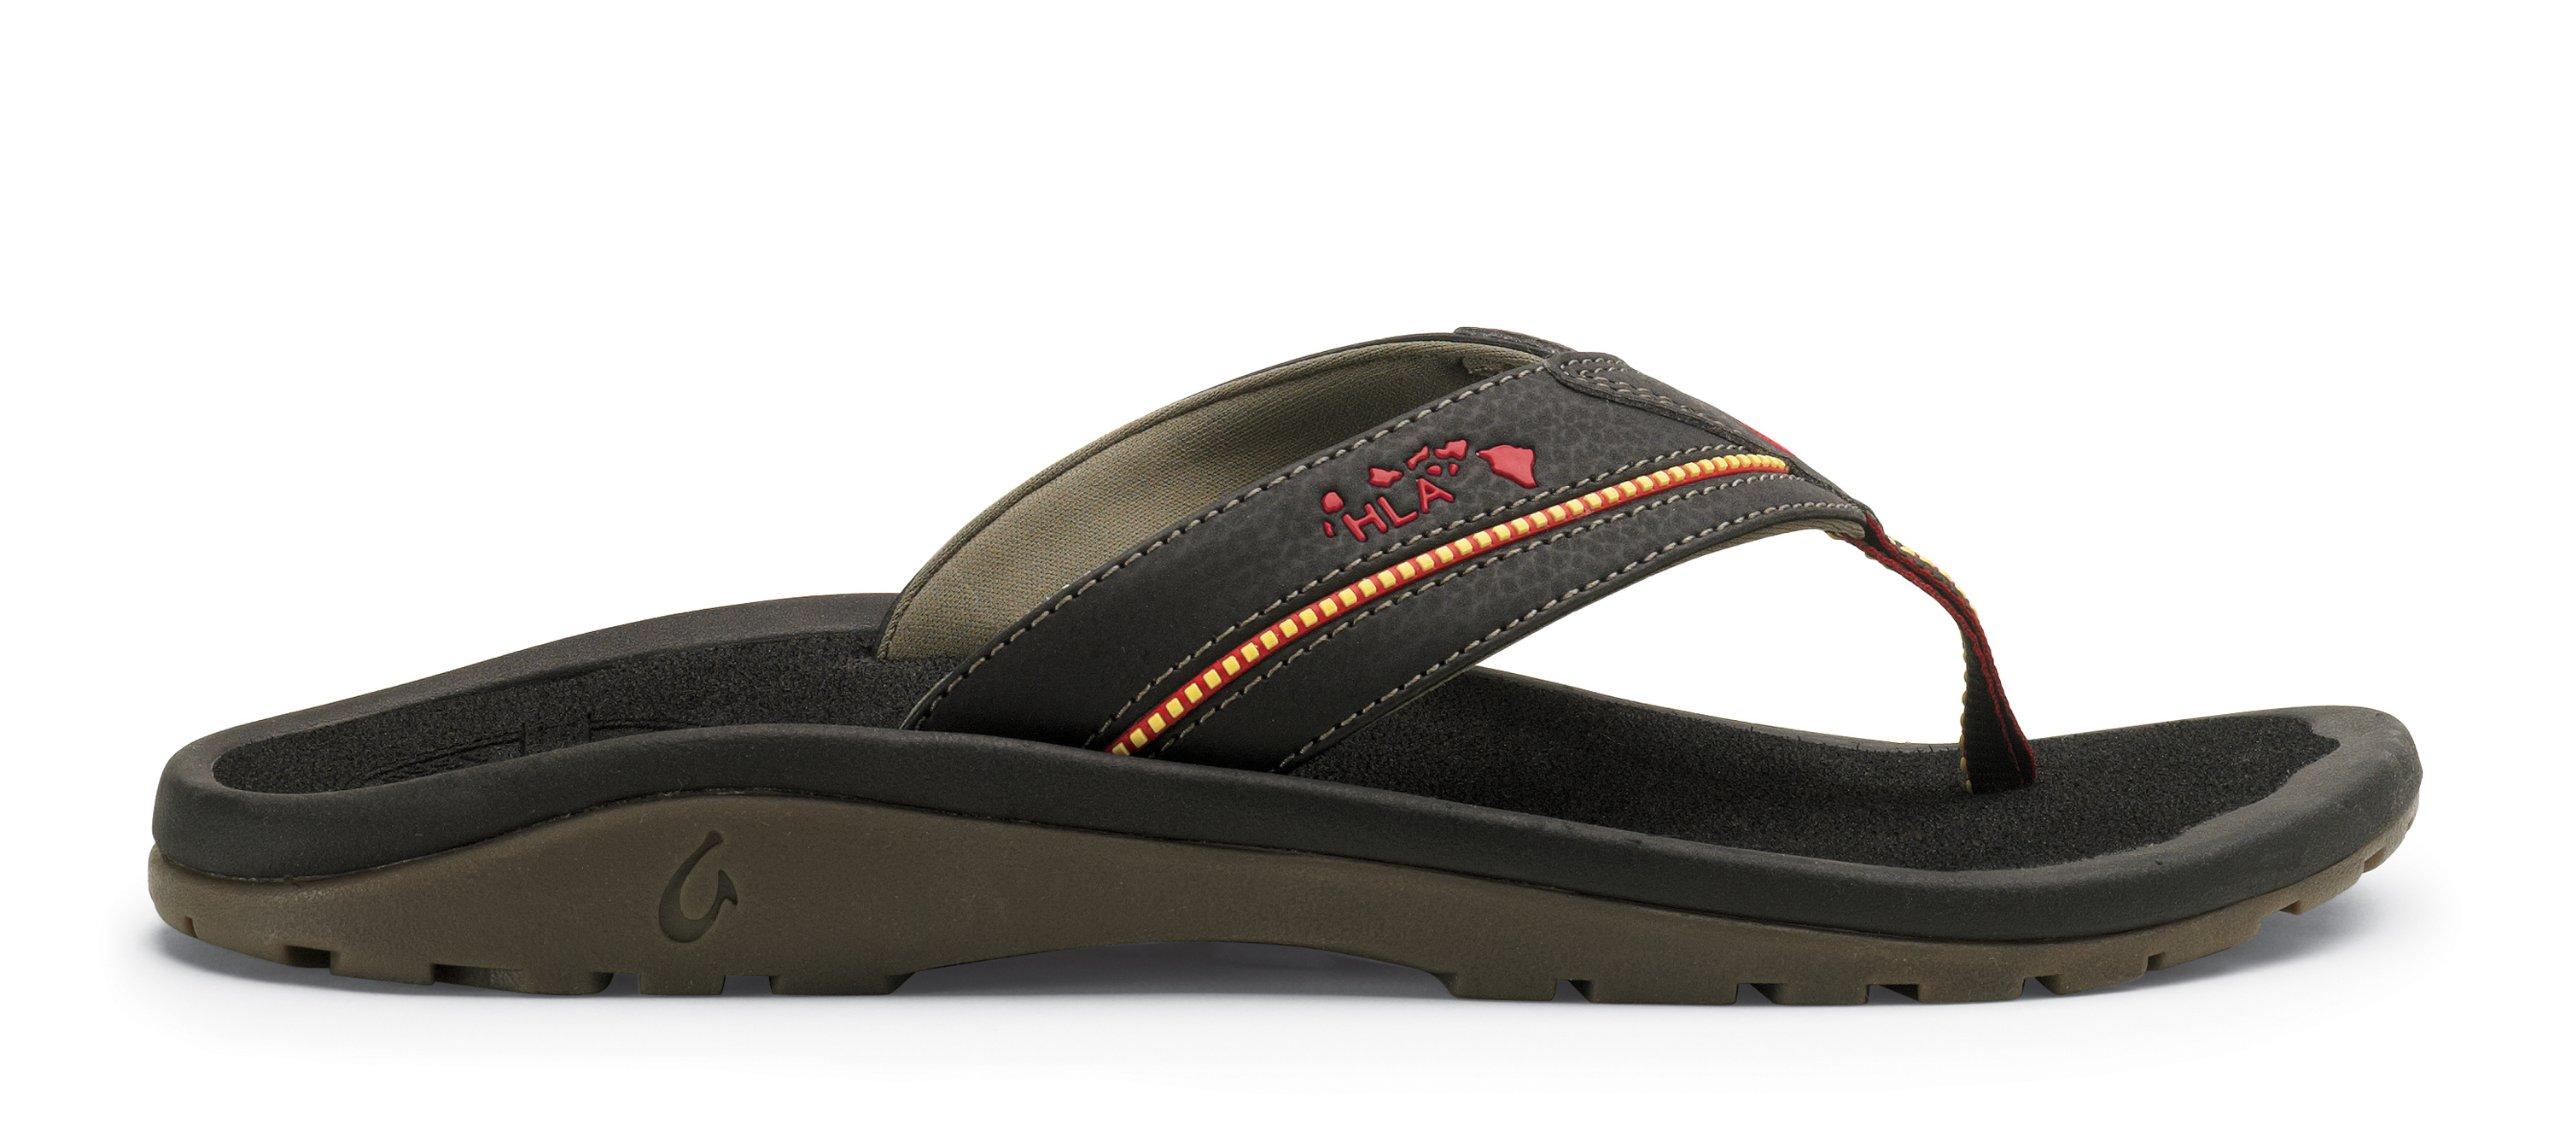 OLUKAI Kia'I II Sandal - Men's Black/Black 11